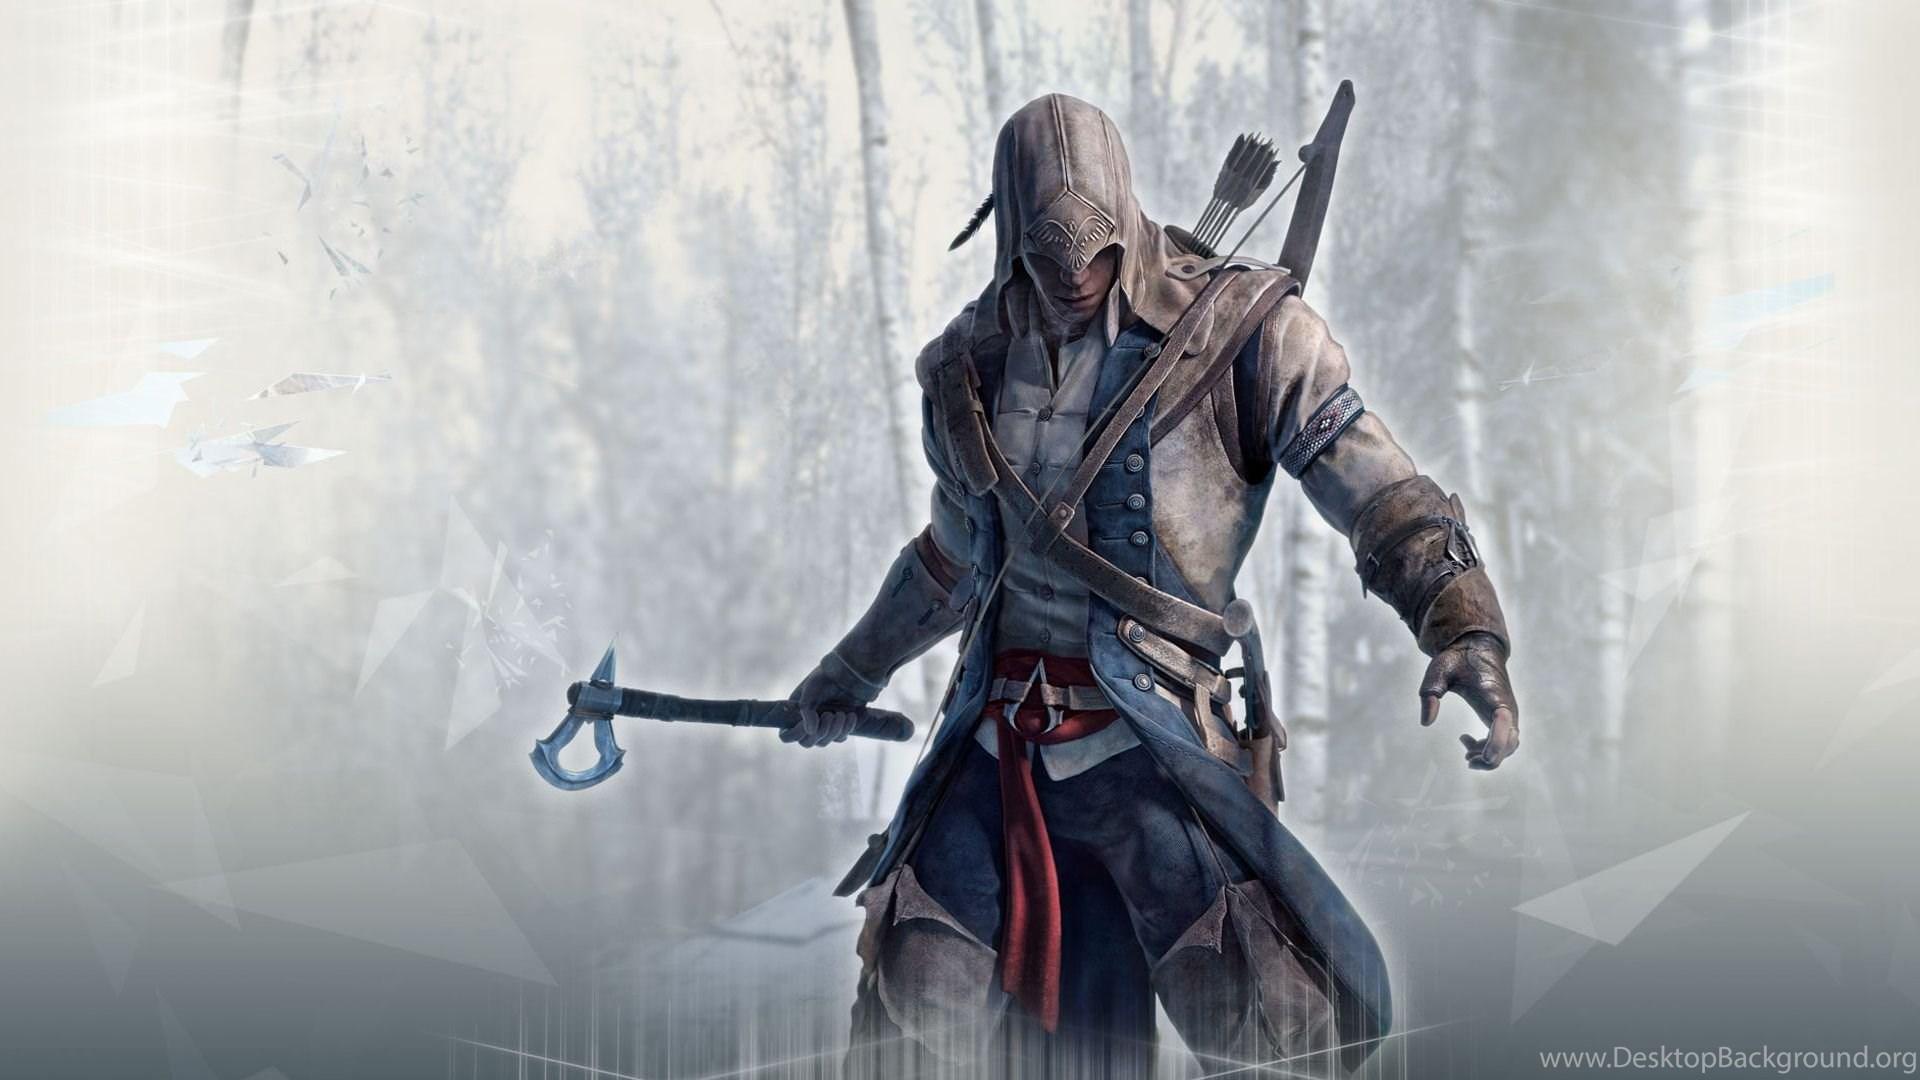 Assassins Creed 3 Hd Wallpaper Assassins Creed 3 Images New Desktop Background